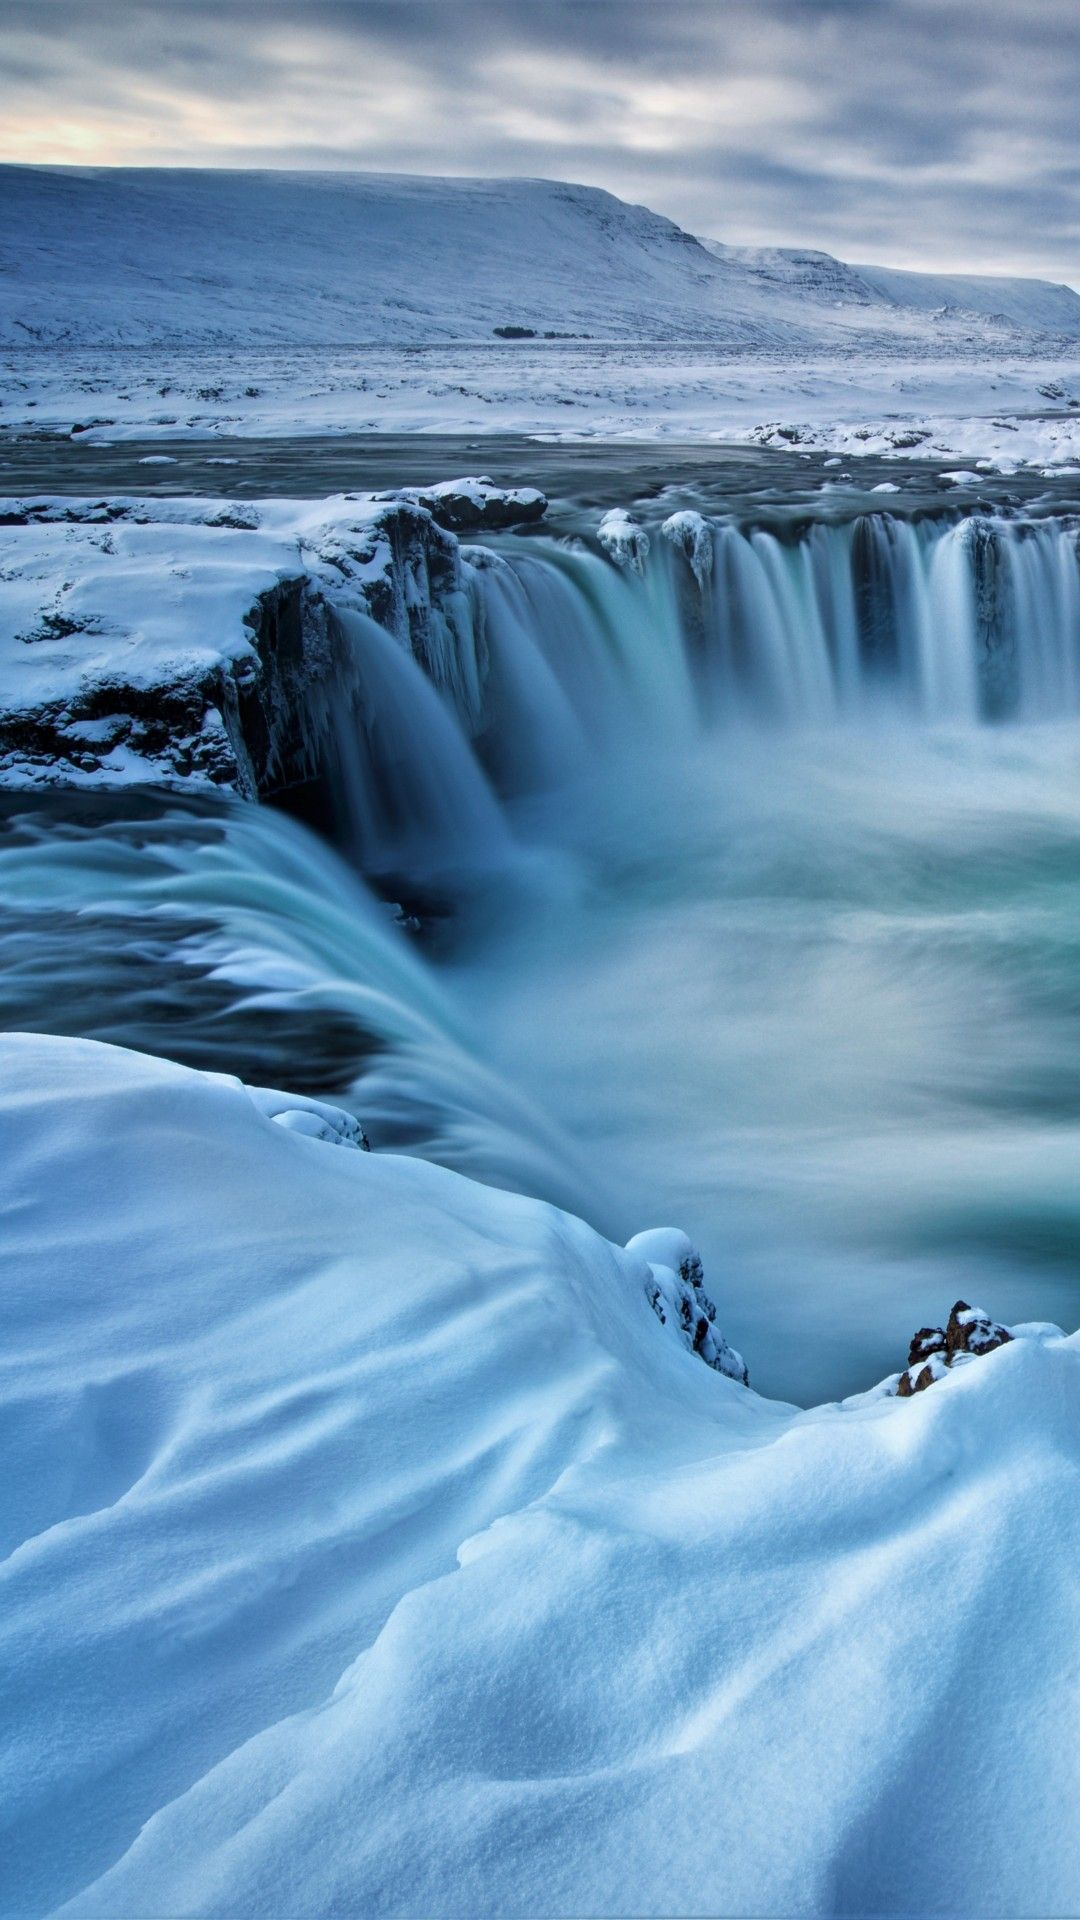 The Godafoss Waterfall Iceland Photo